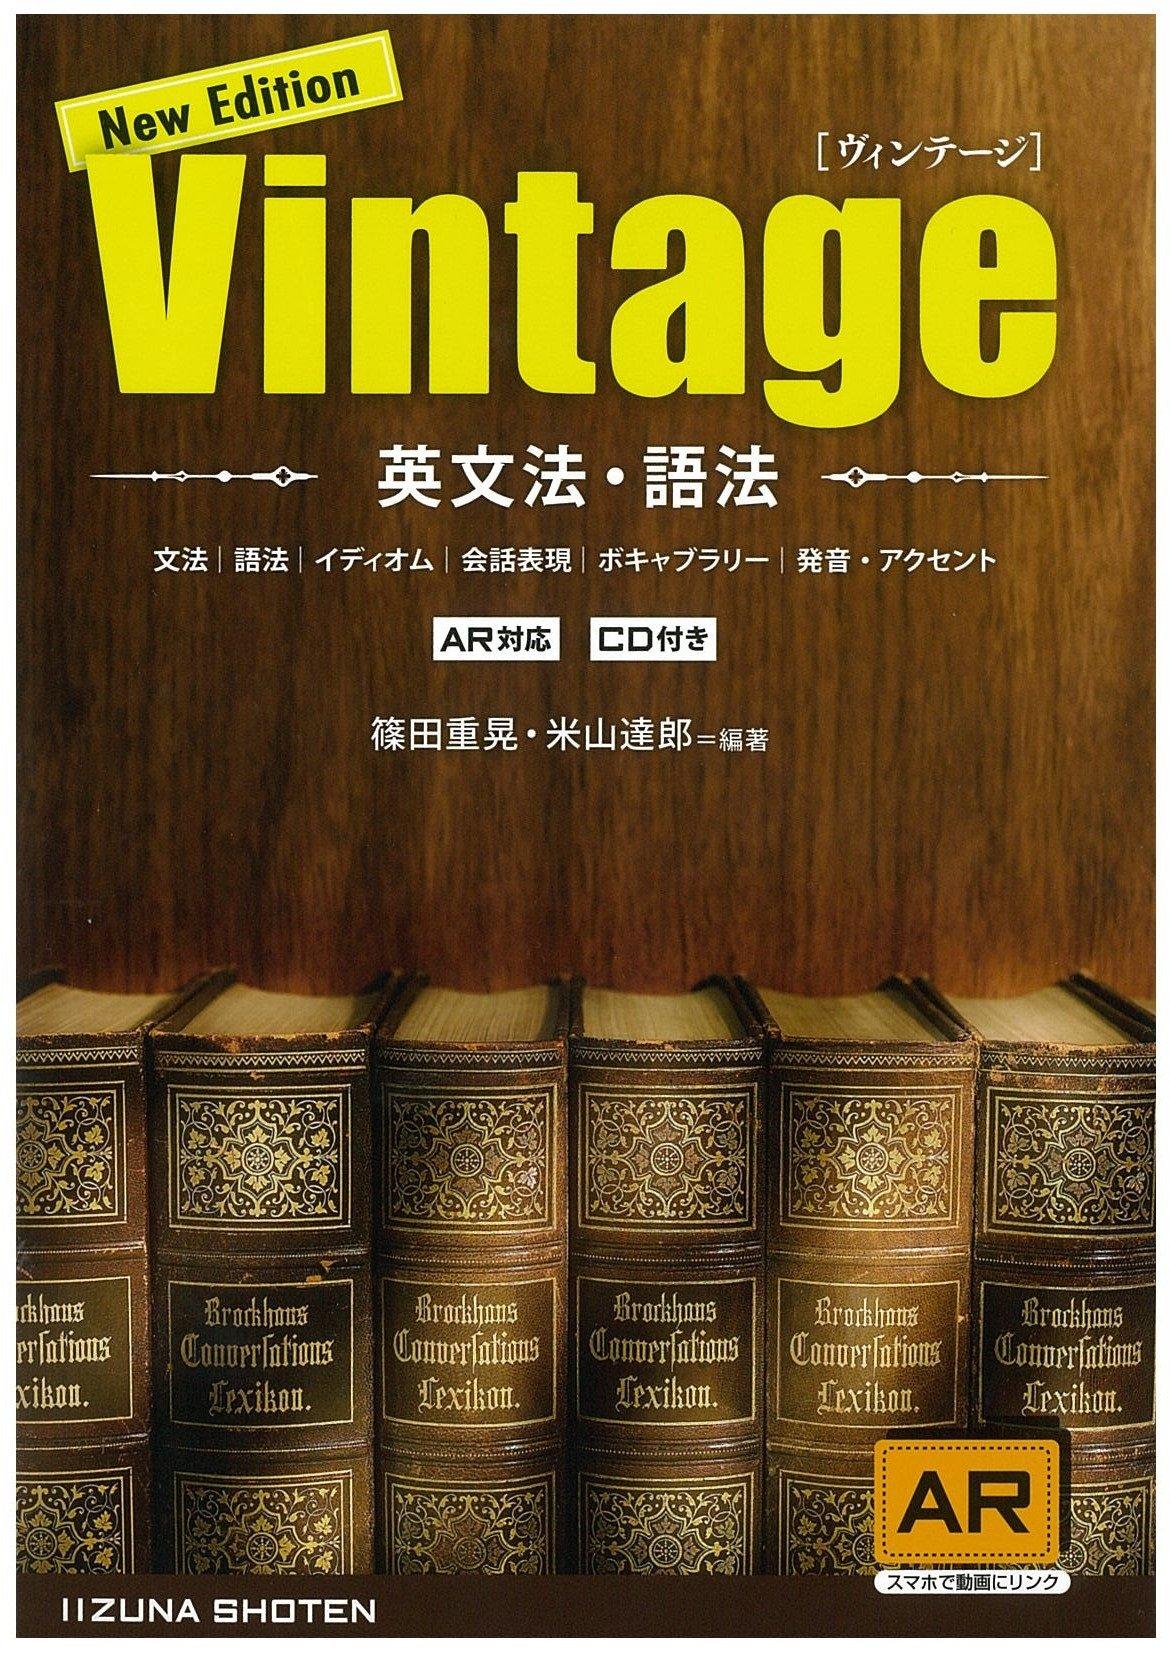 NAVER まとめ大学受験 英語を旧帝レベルへと確実に引き上げる勉強法